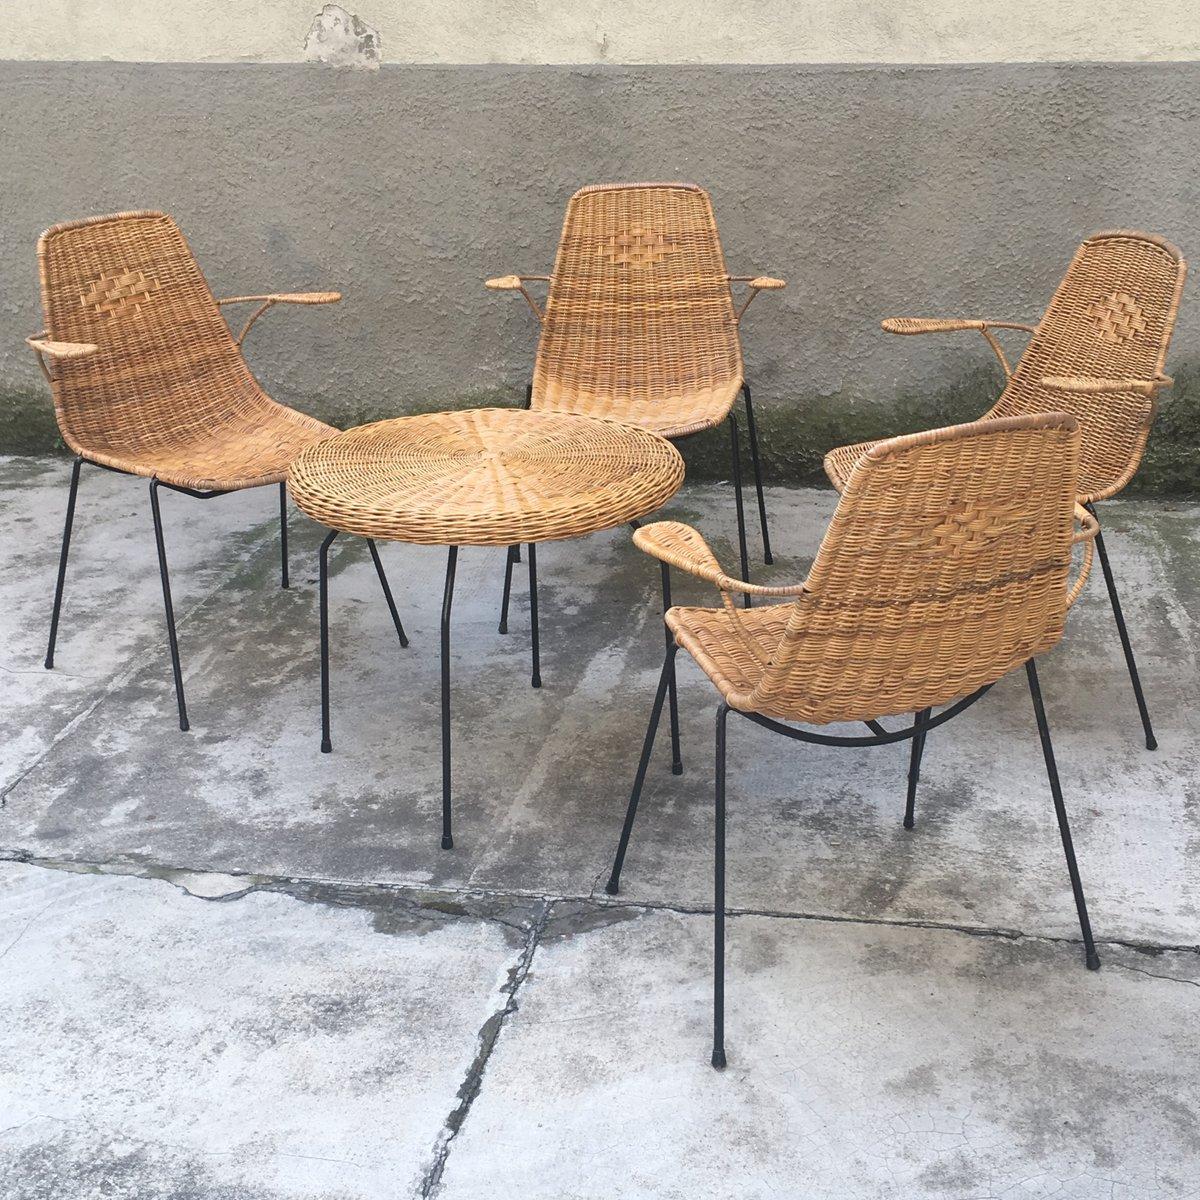 Vintage Rattan Metal Outdoor Lounge Set For Sale At Pamono